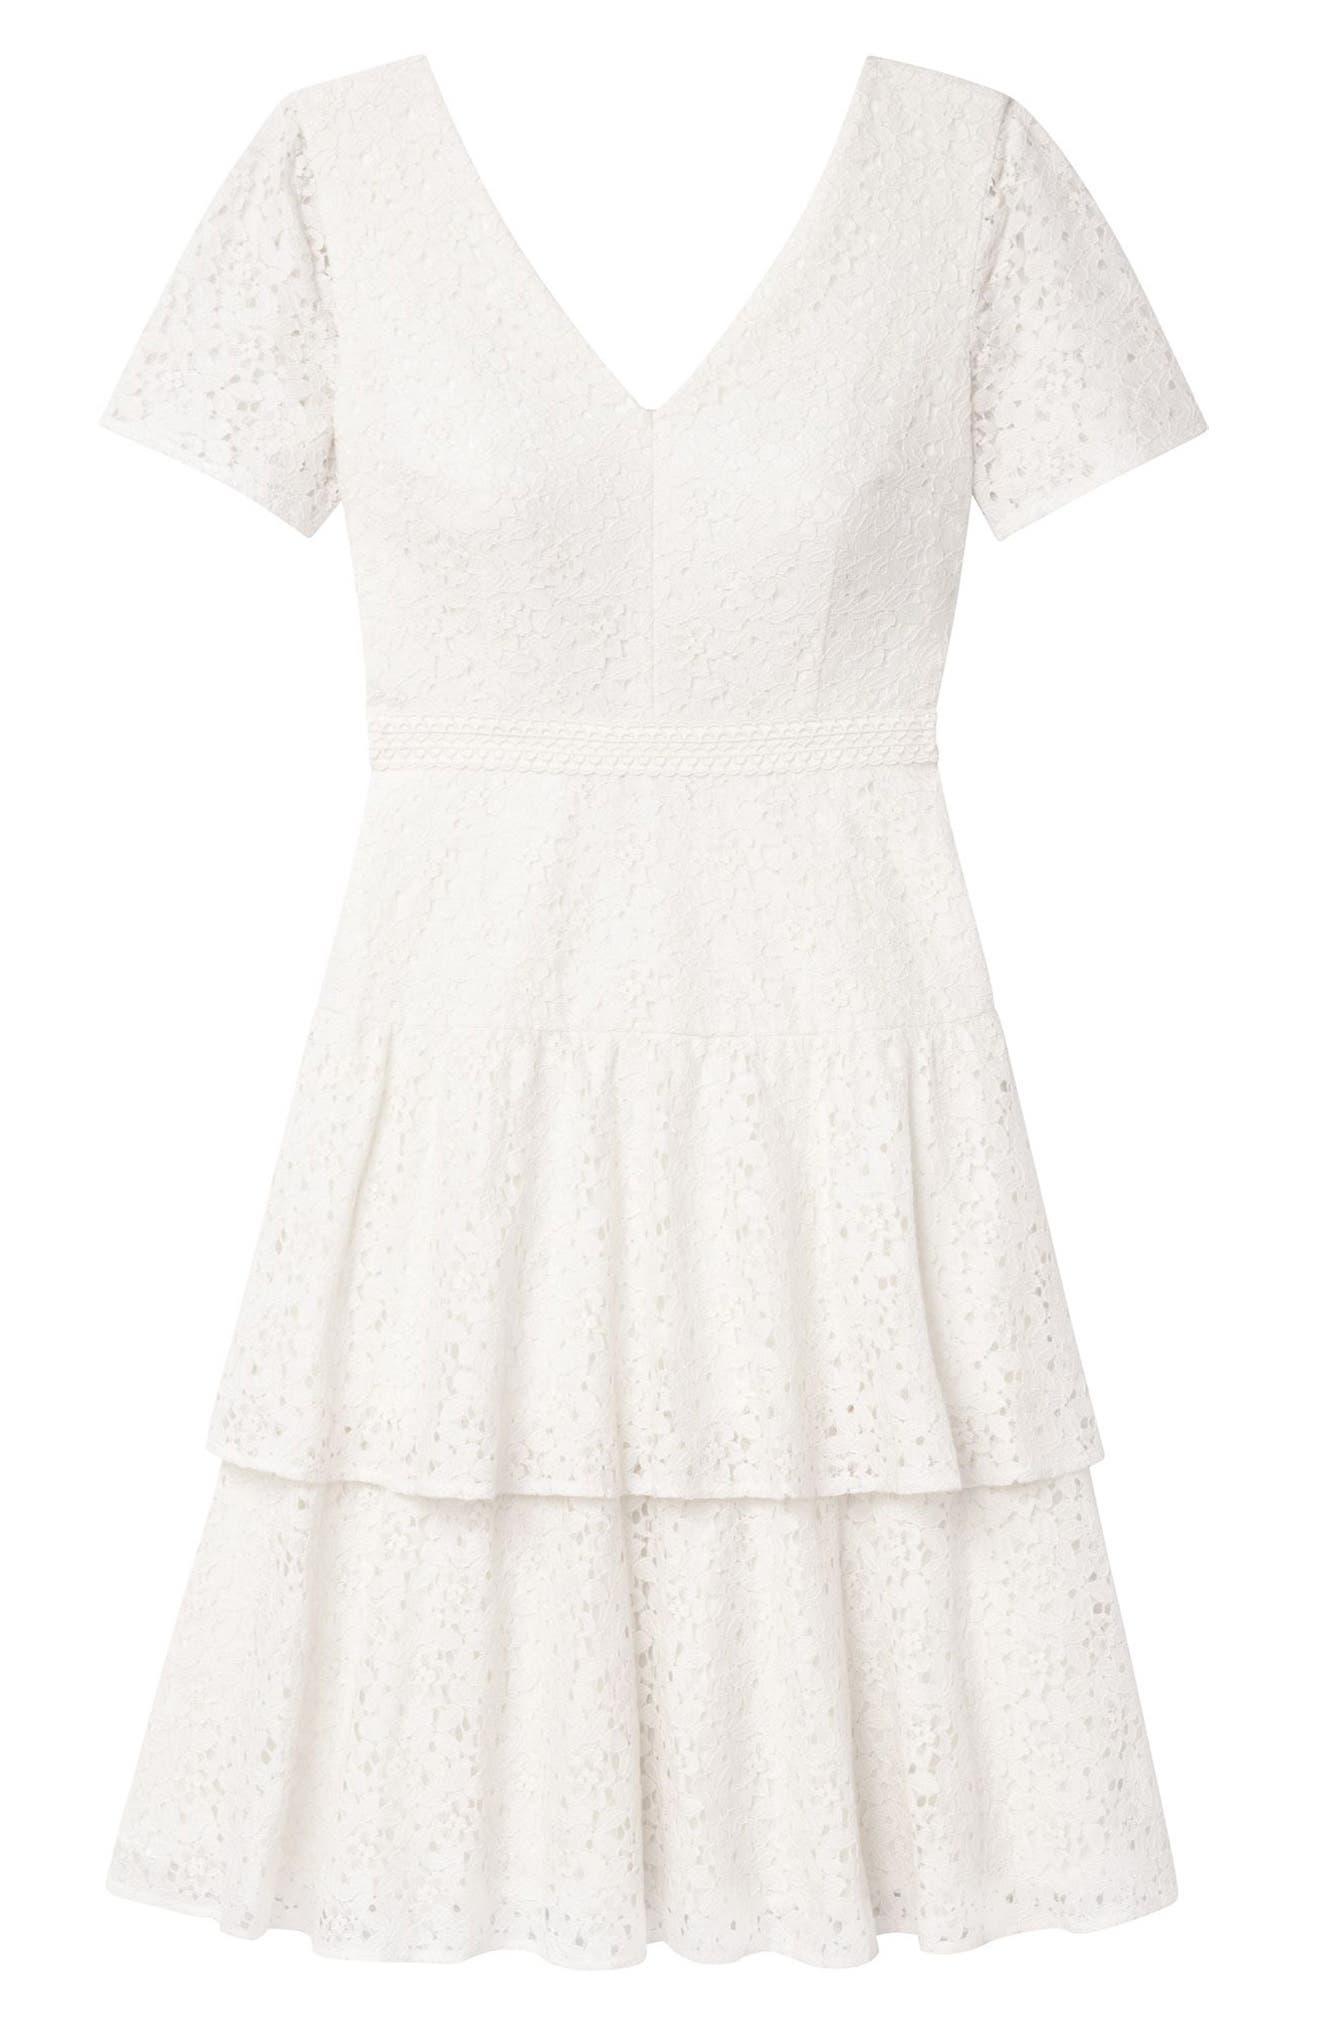 Doris Bow Back Tiered Skirt Lace Dress,                             Alternate thumbnail 6, color,                             CREAM